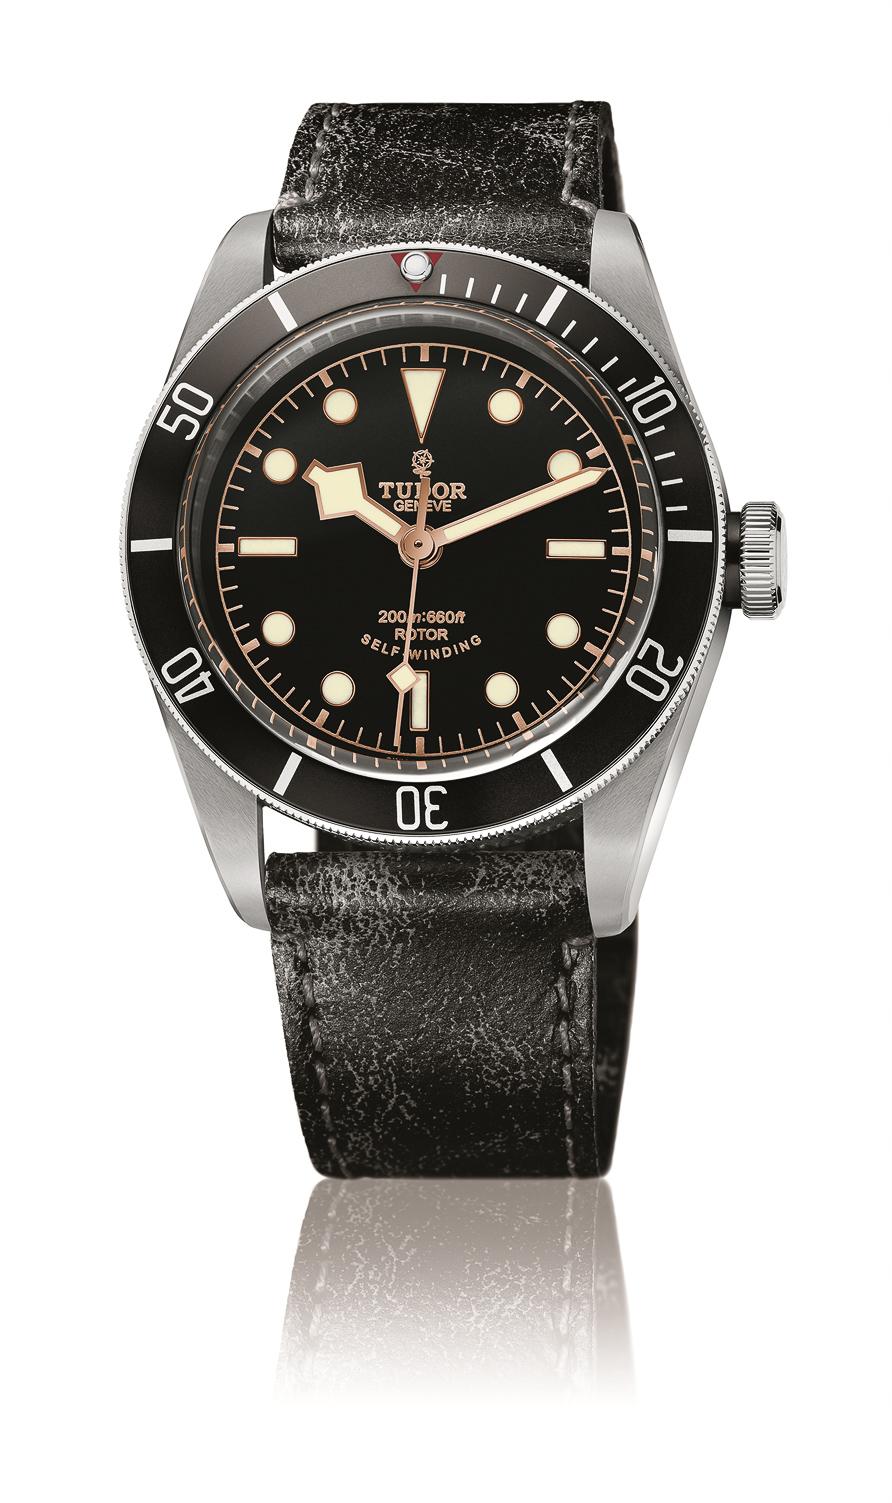 Favoriten: Uhren bis 5.000 Euro - Editor\'s Choice #1 (Tudor) - zeigr.com